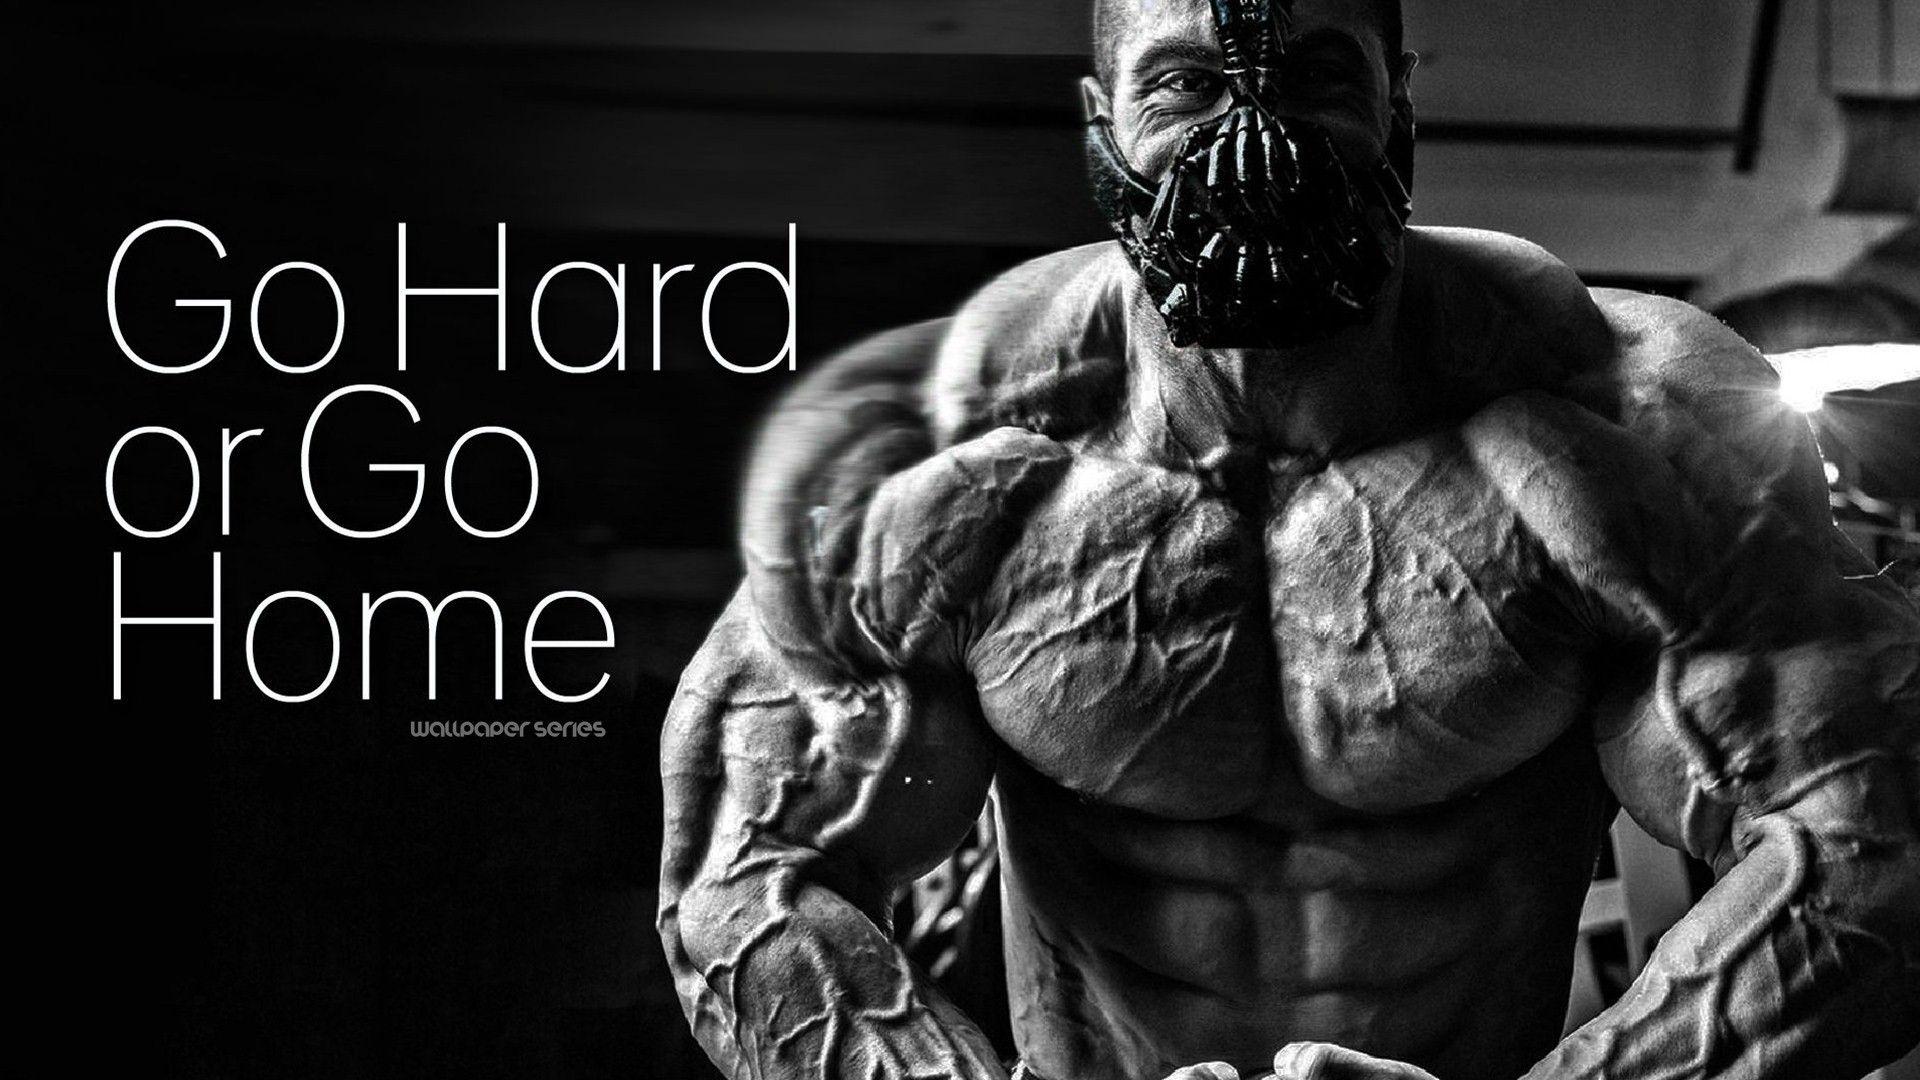 Motivational Workout Wallpaper Motivation Fitness Bodybuilder Bodybuilding Training